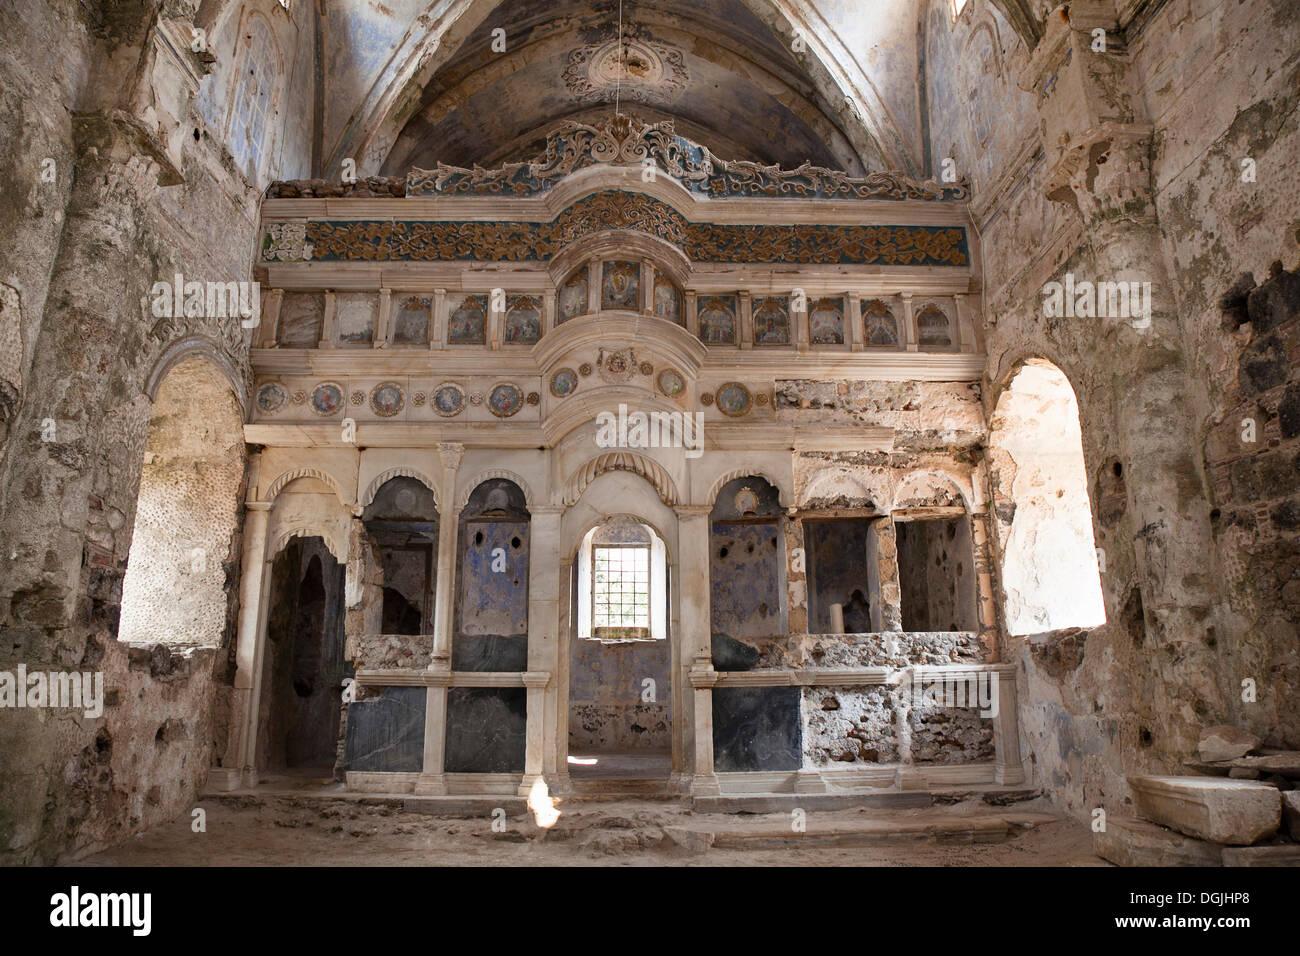 Deserted Greek Orthodox church in the ghost town of Kayakoey near Fethiye, former Levissi, Lycia, Mediterranean, Turkey - Stock Image